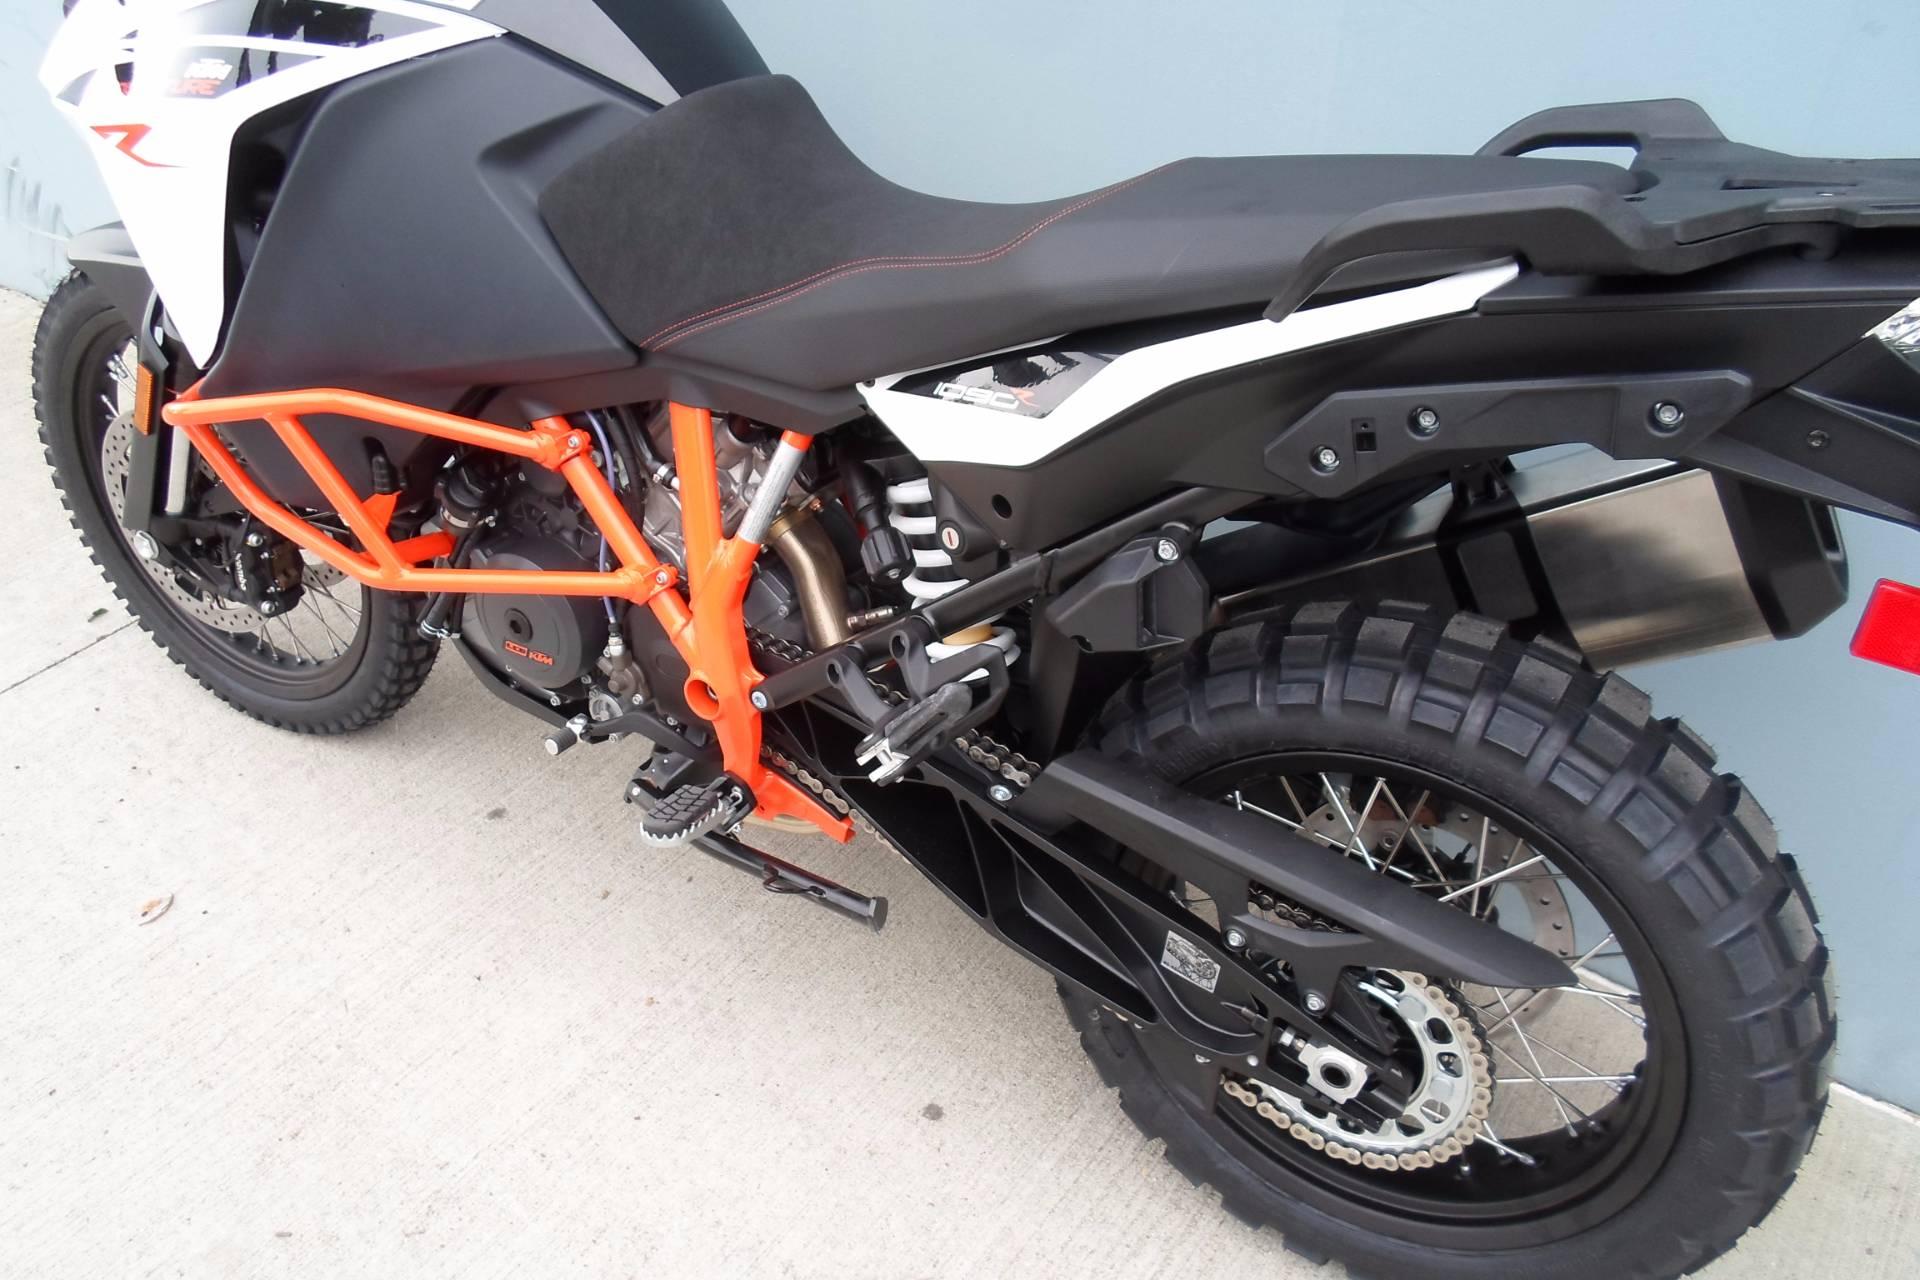 new 2017 ktm 1090 adventure r motorcycles in san marcos, ca